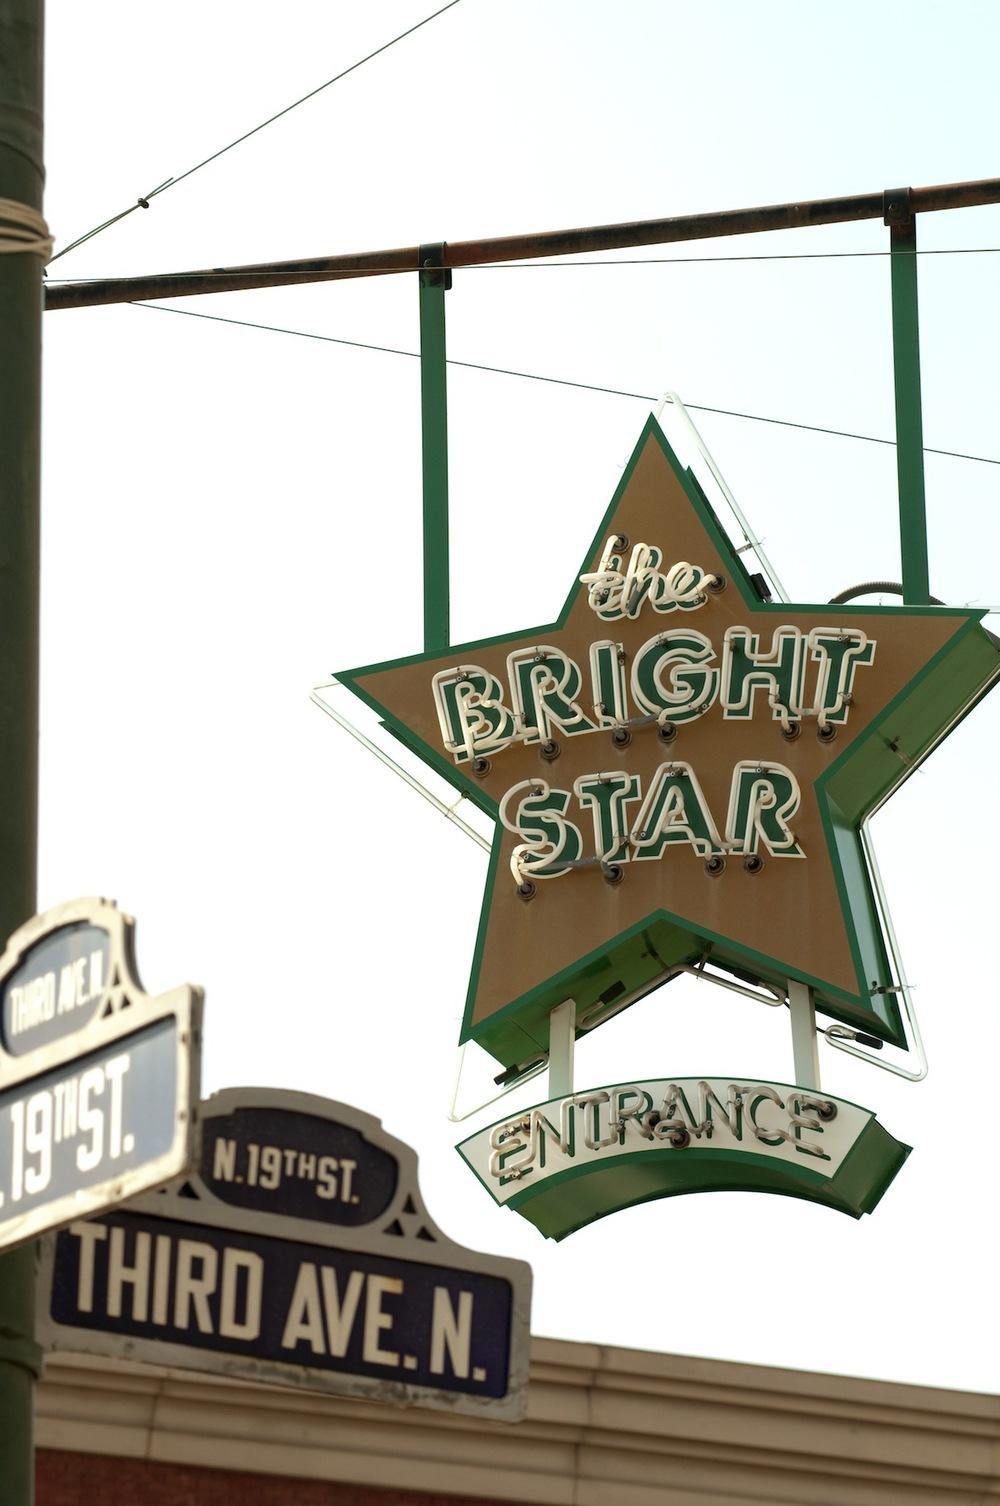 063BrightStar_NALc2011 (1).JPG